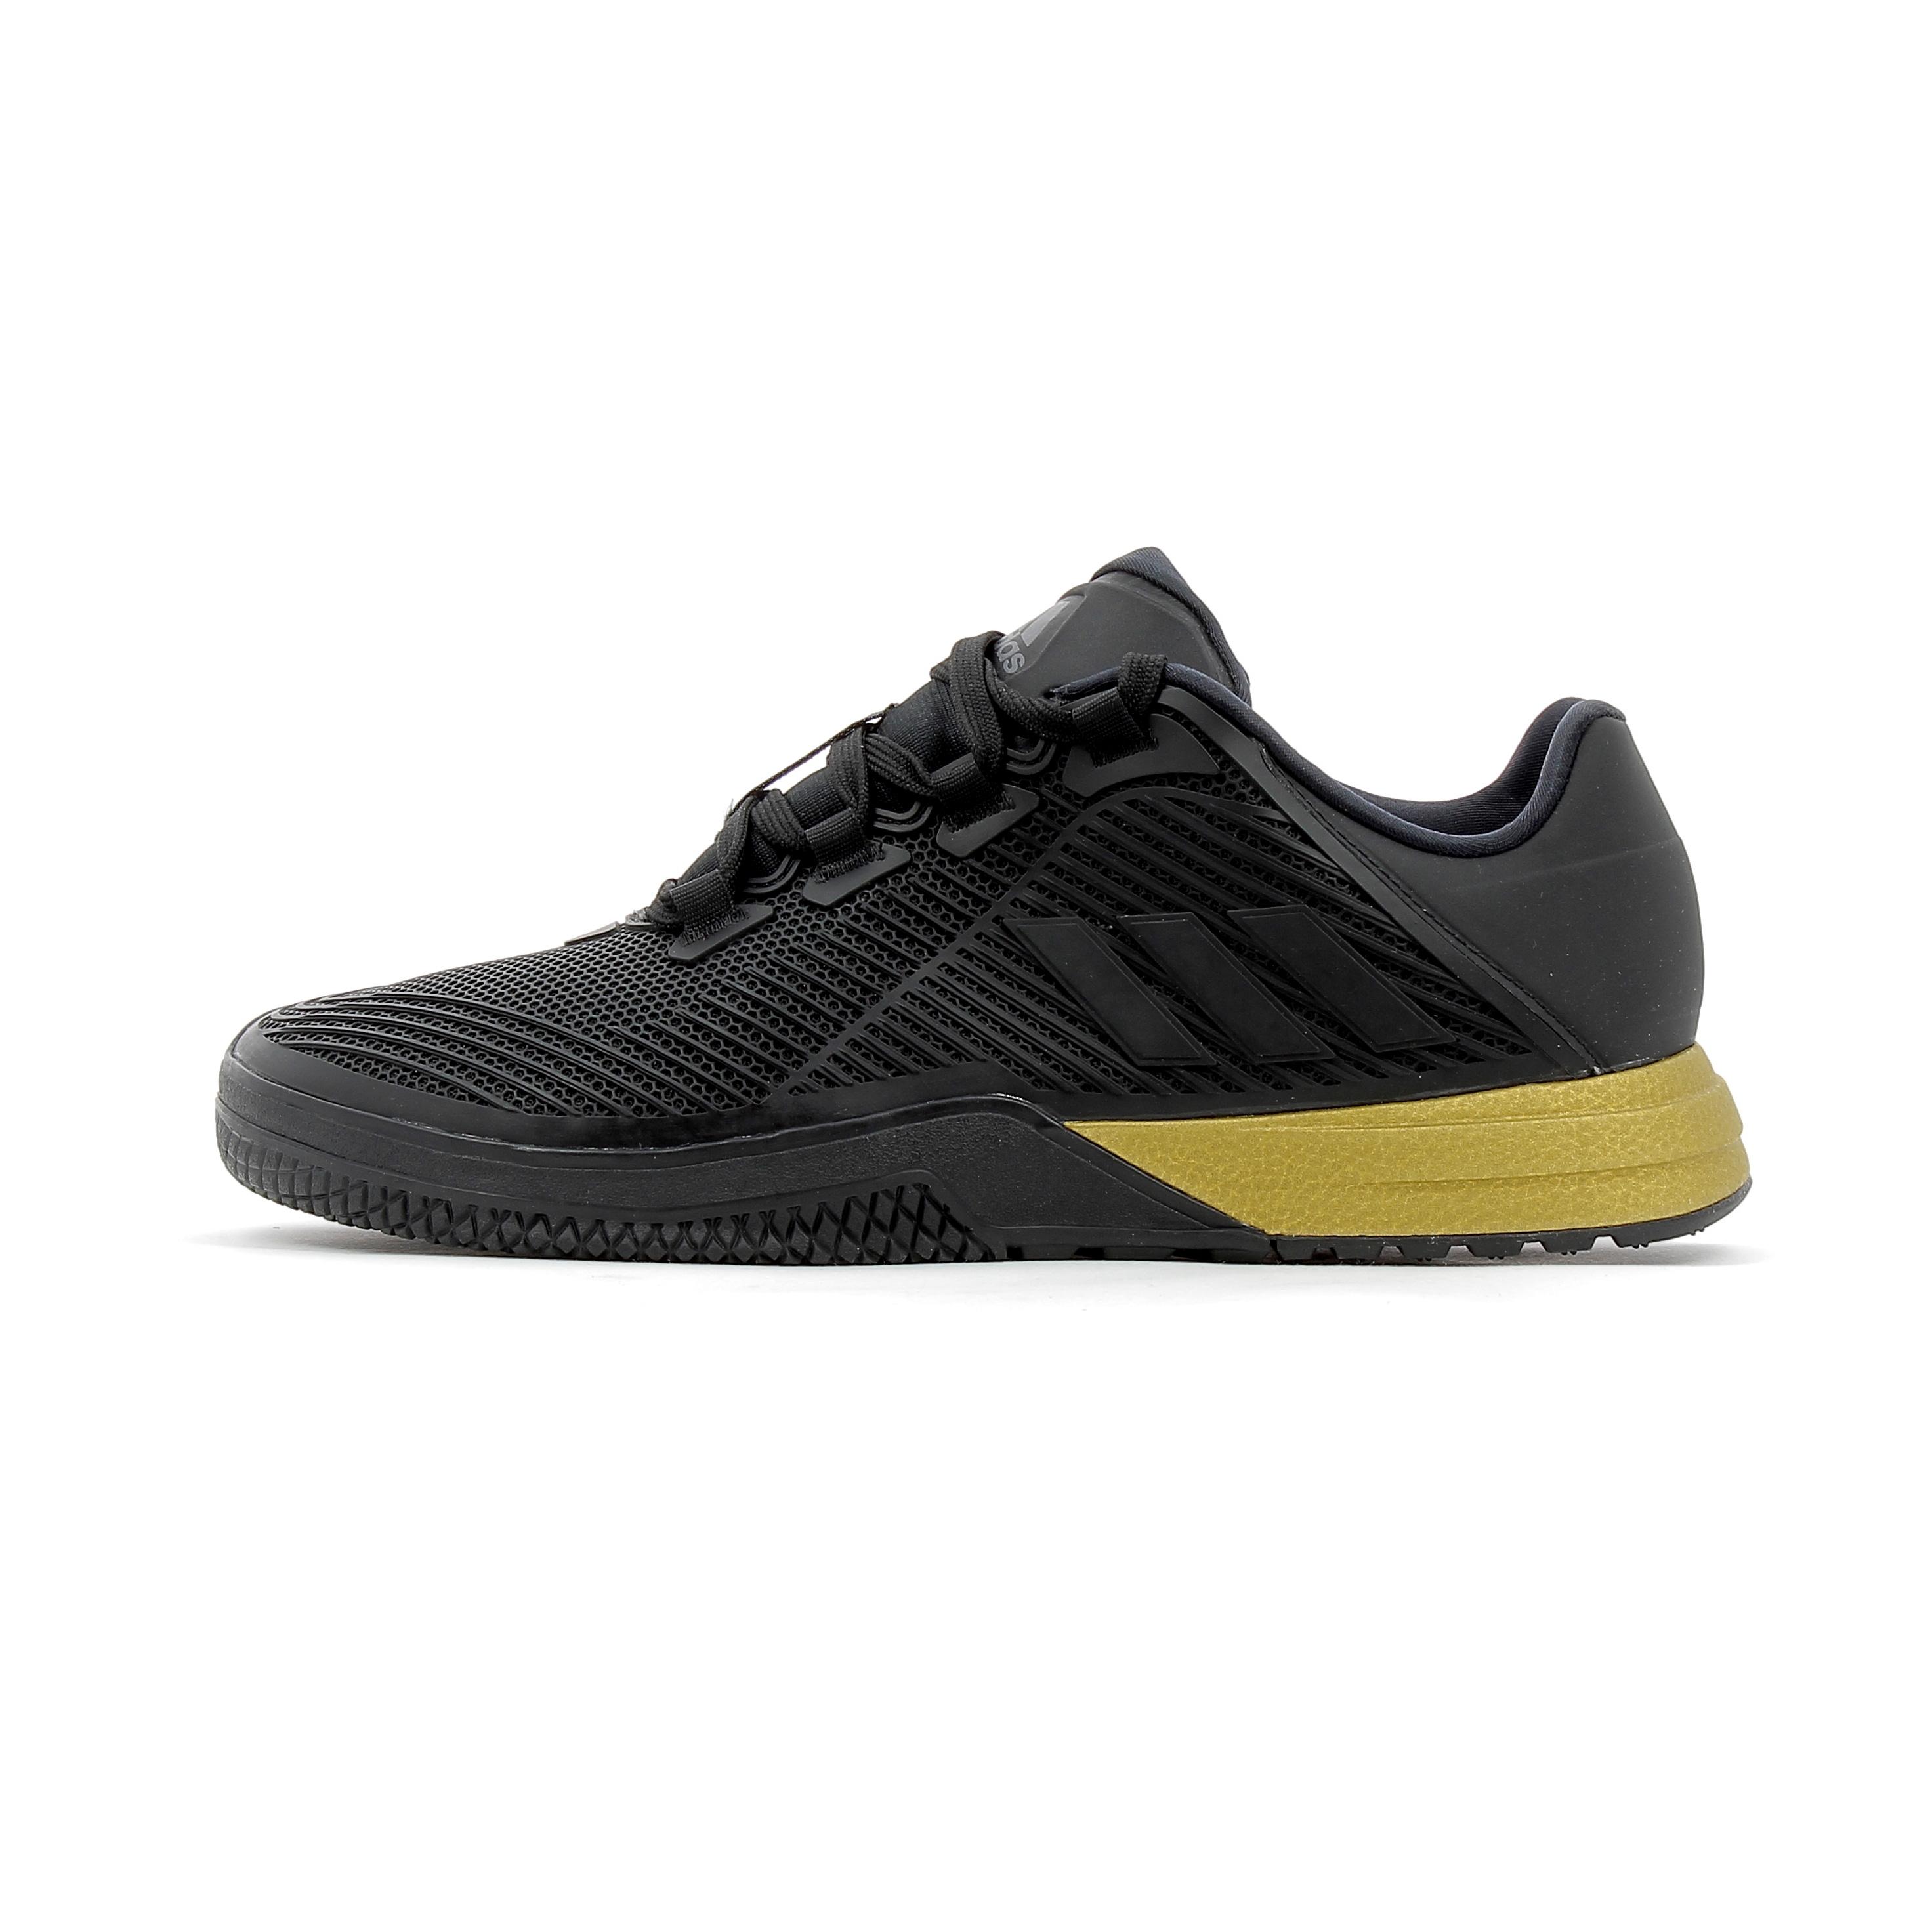 Power M Trainer Crazy Training De Chaussures Adidas Cross Running Y6yb7gvf